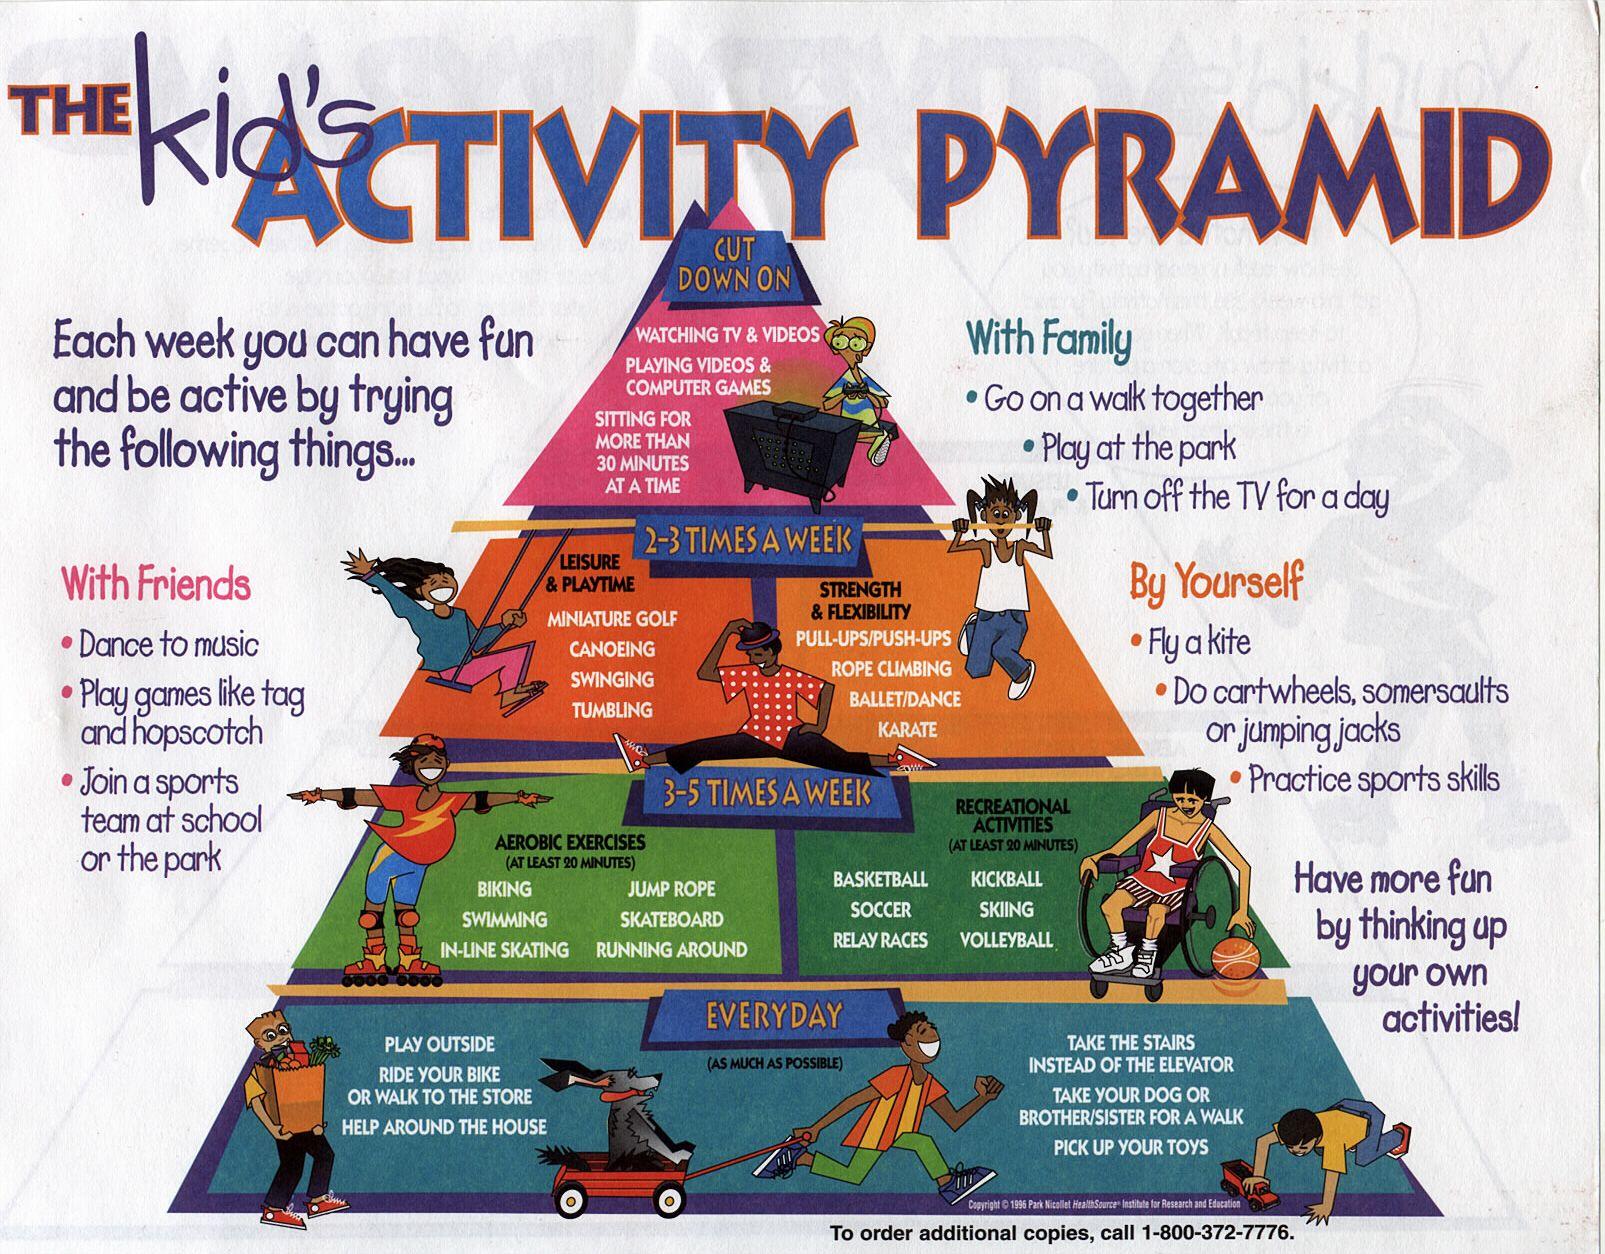 PE Activity Pyramid.jpg 1 605×1 254 pixels | Infographics ...